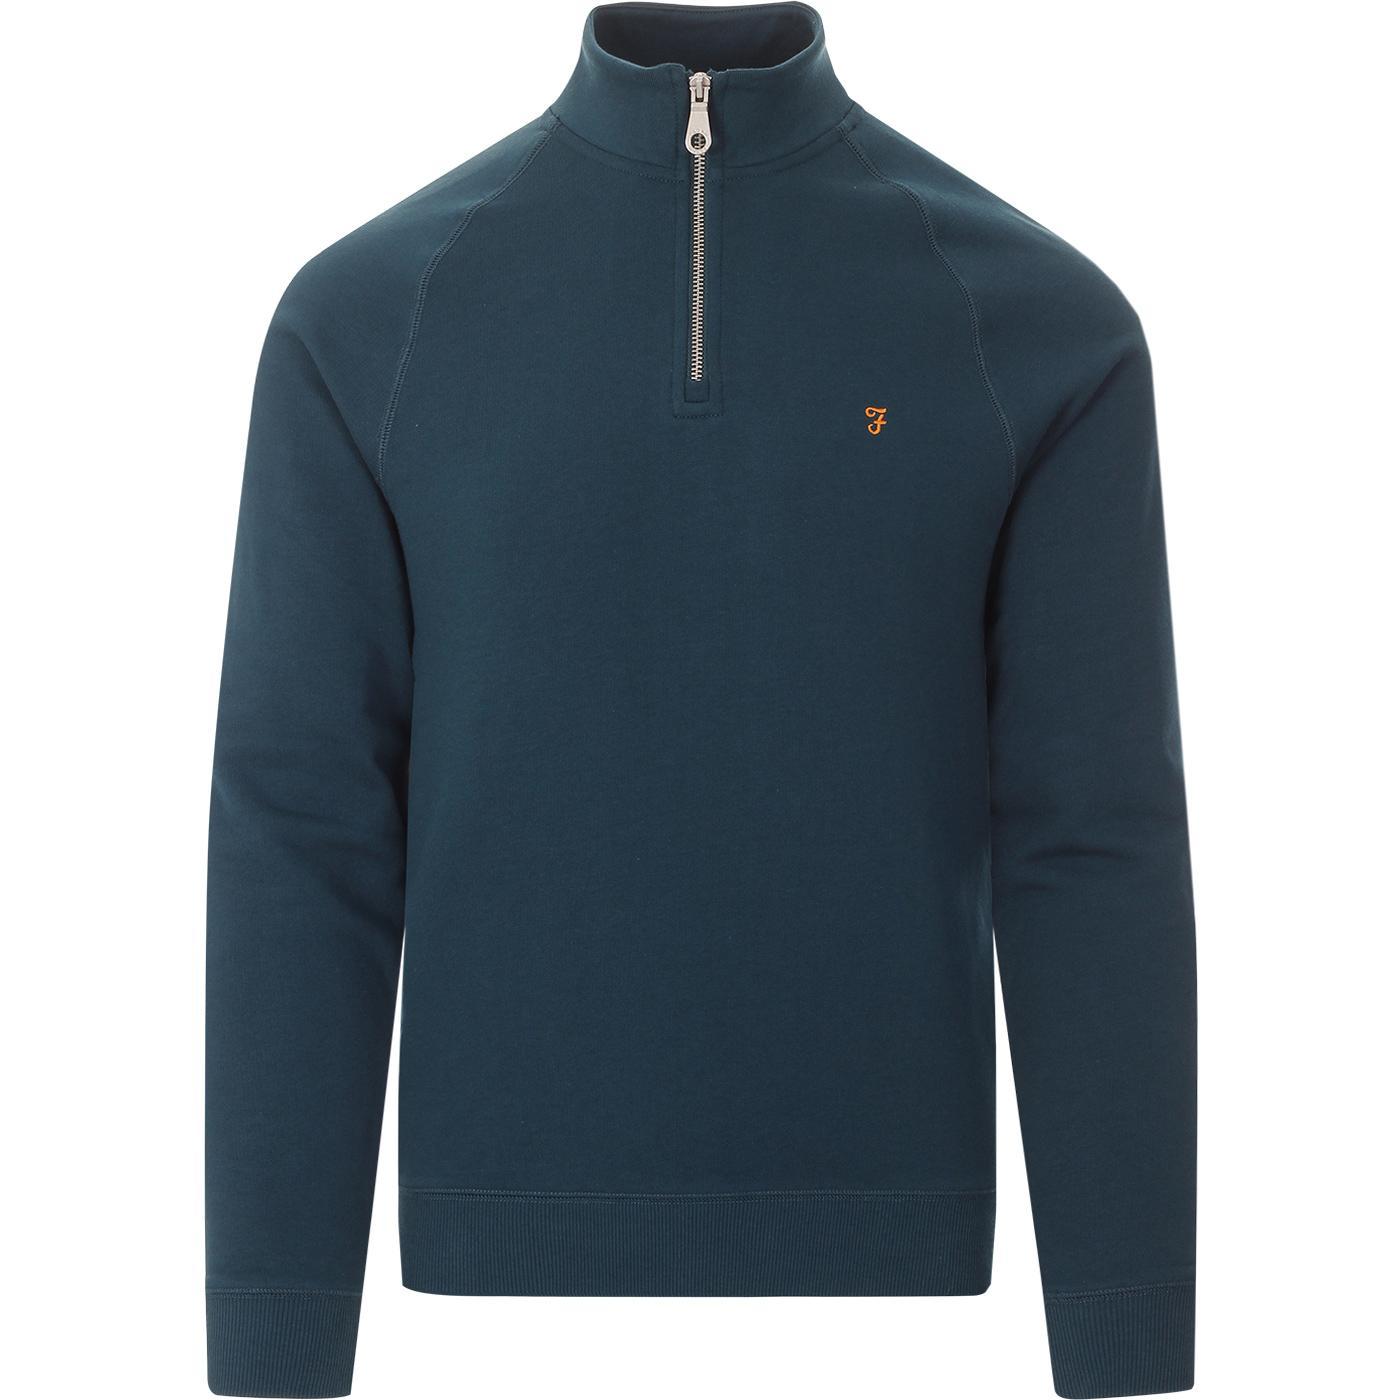 Jim FARAH 1/4 Zip Jersey Sweatshirt (Atlantic)